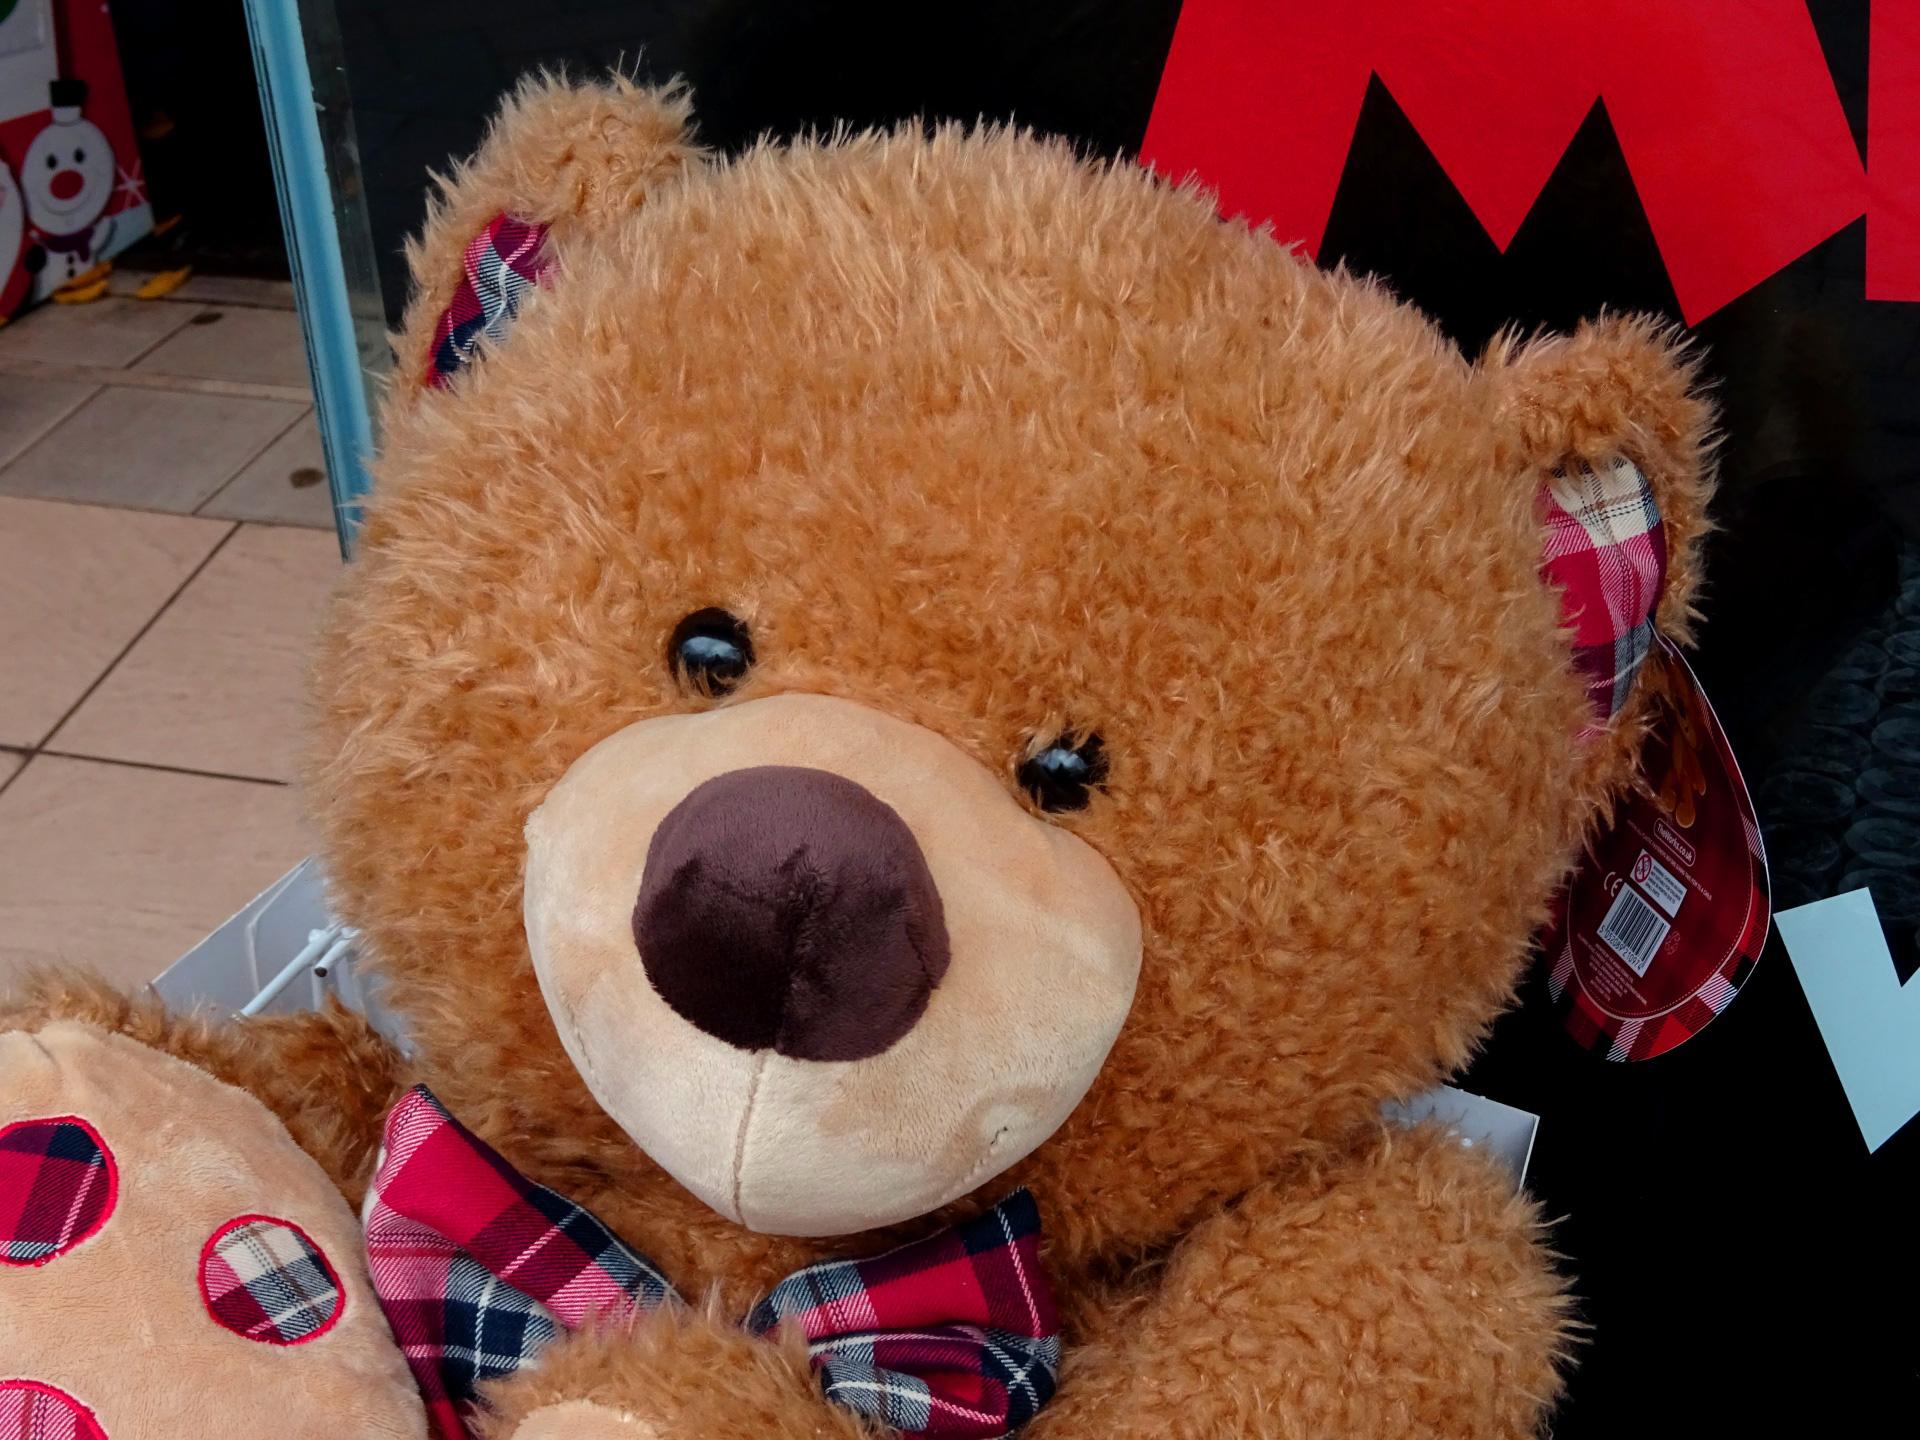 teddy bear Images Wallpaper pics Download